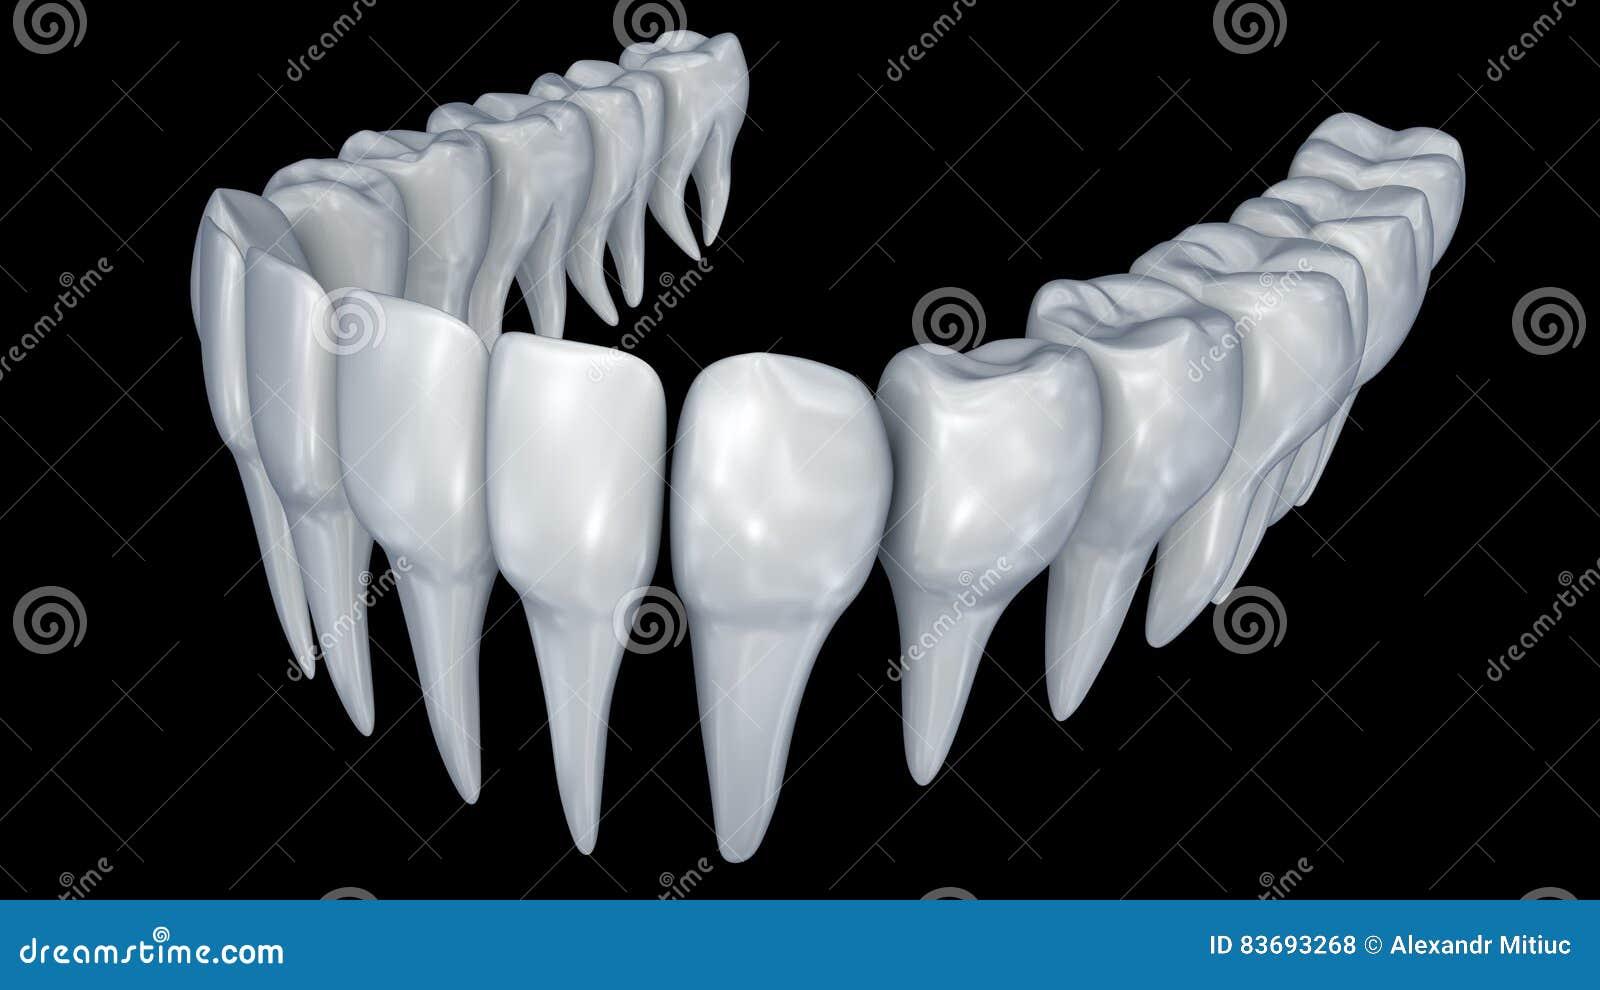 Human Teeth 3d Animation Stock Footage Illustration Of Dentistry